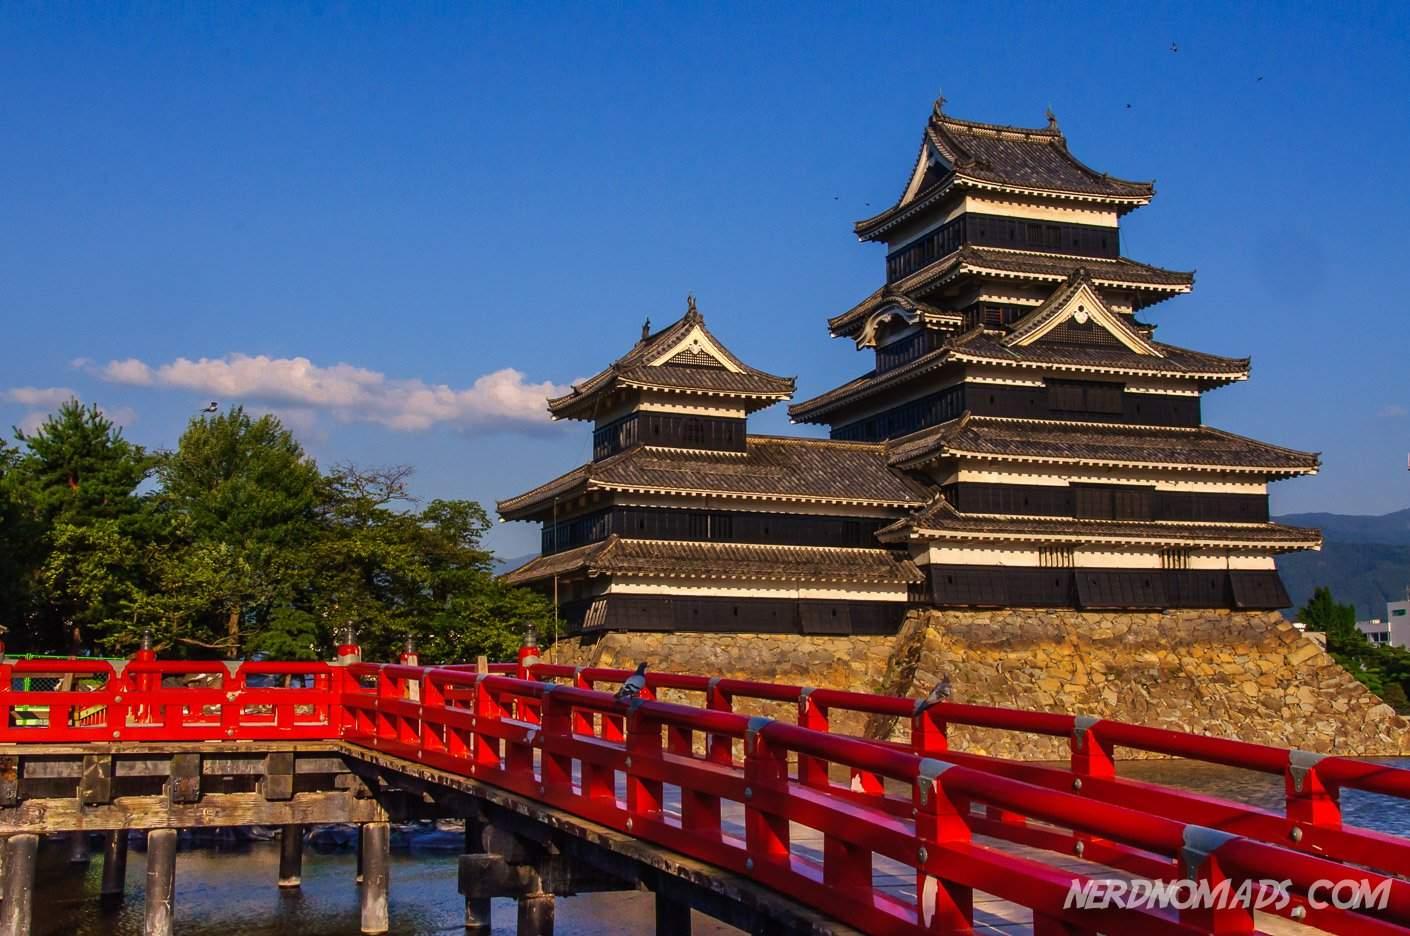 japan two week itinerary nerd nomads